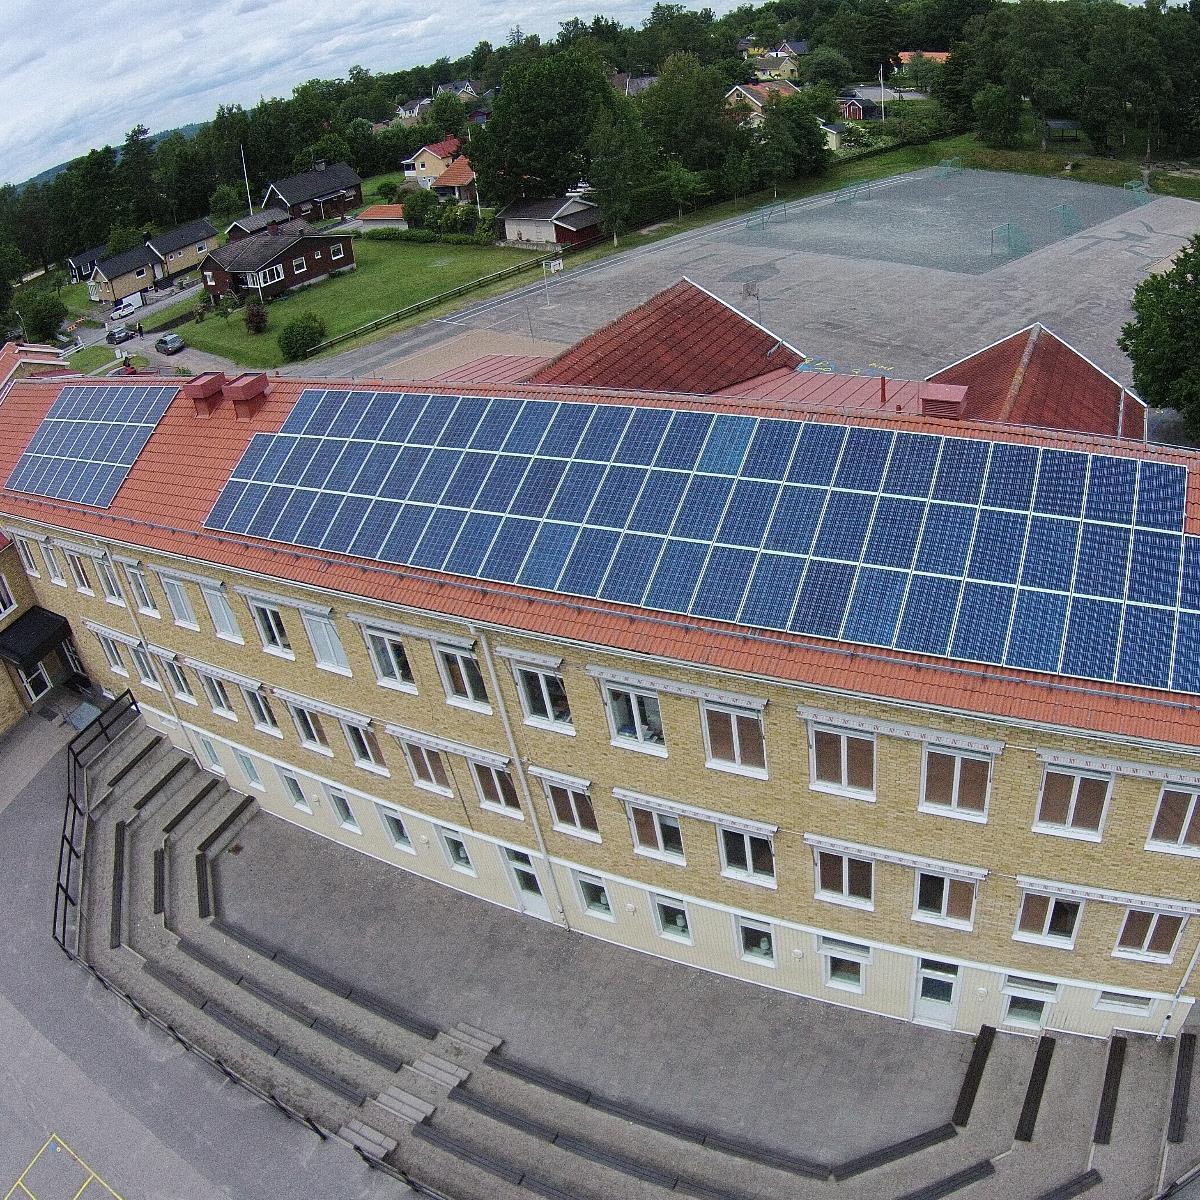 Case Study: Solar Energy, Solpanelen.nu